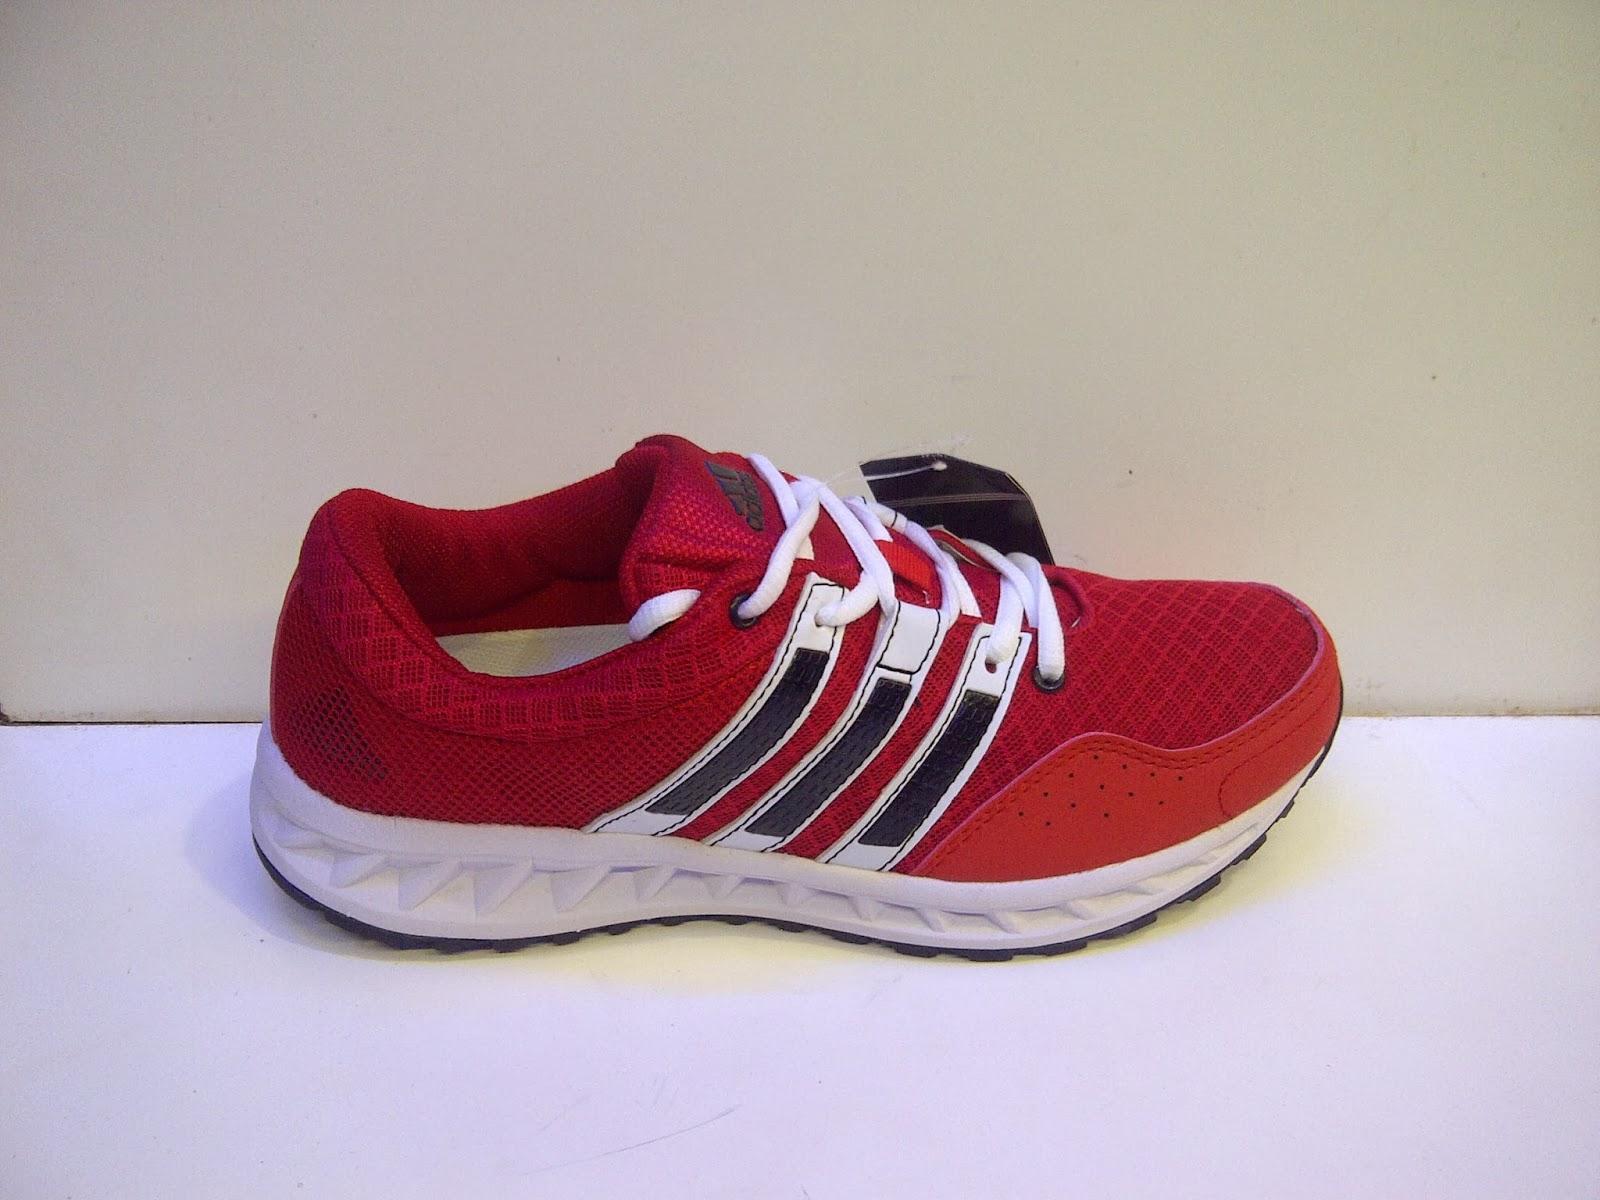 sepatu merah, adidas merah, sepatu Adidas Falcon Elite 2 red, sepatu adidas running merah